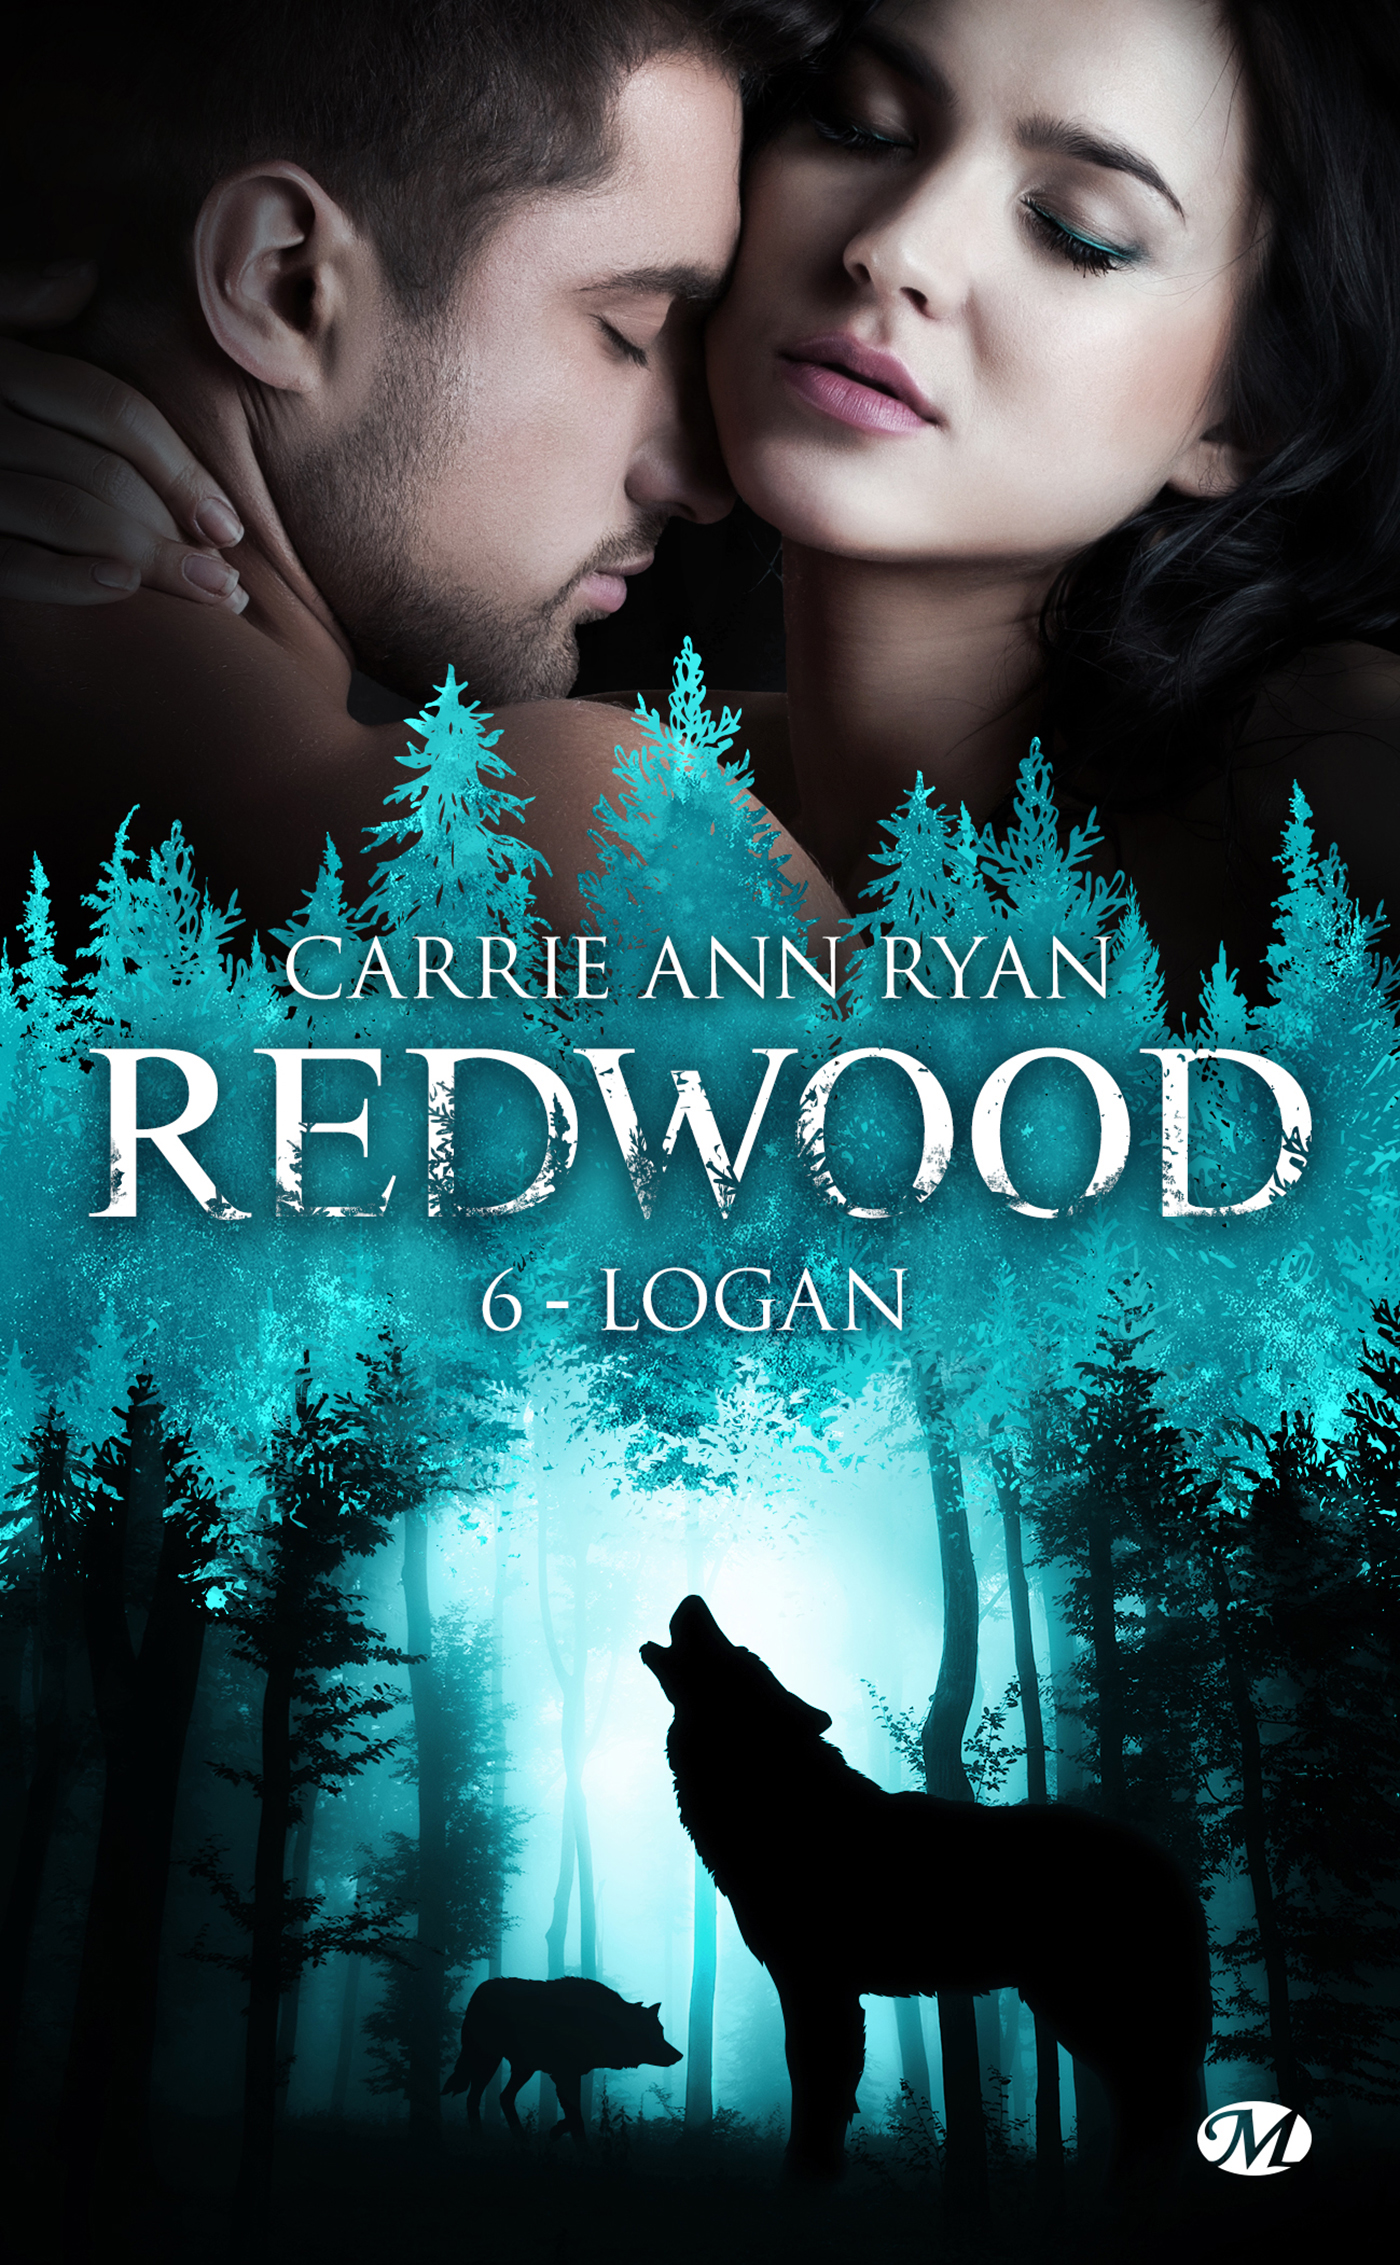 cdn1.booknode.com/book_cover/1315/full/redwood-tome-6-logan-1315278.jpg